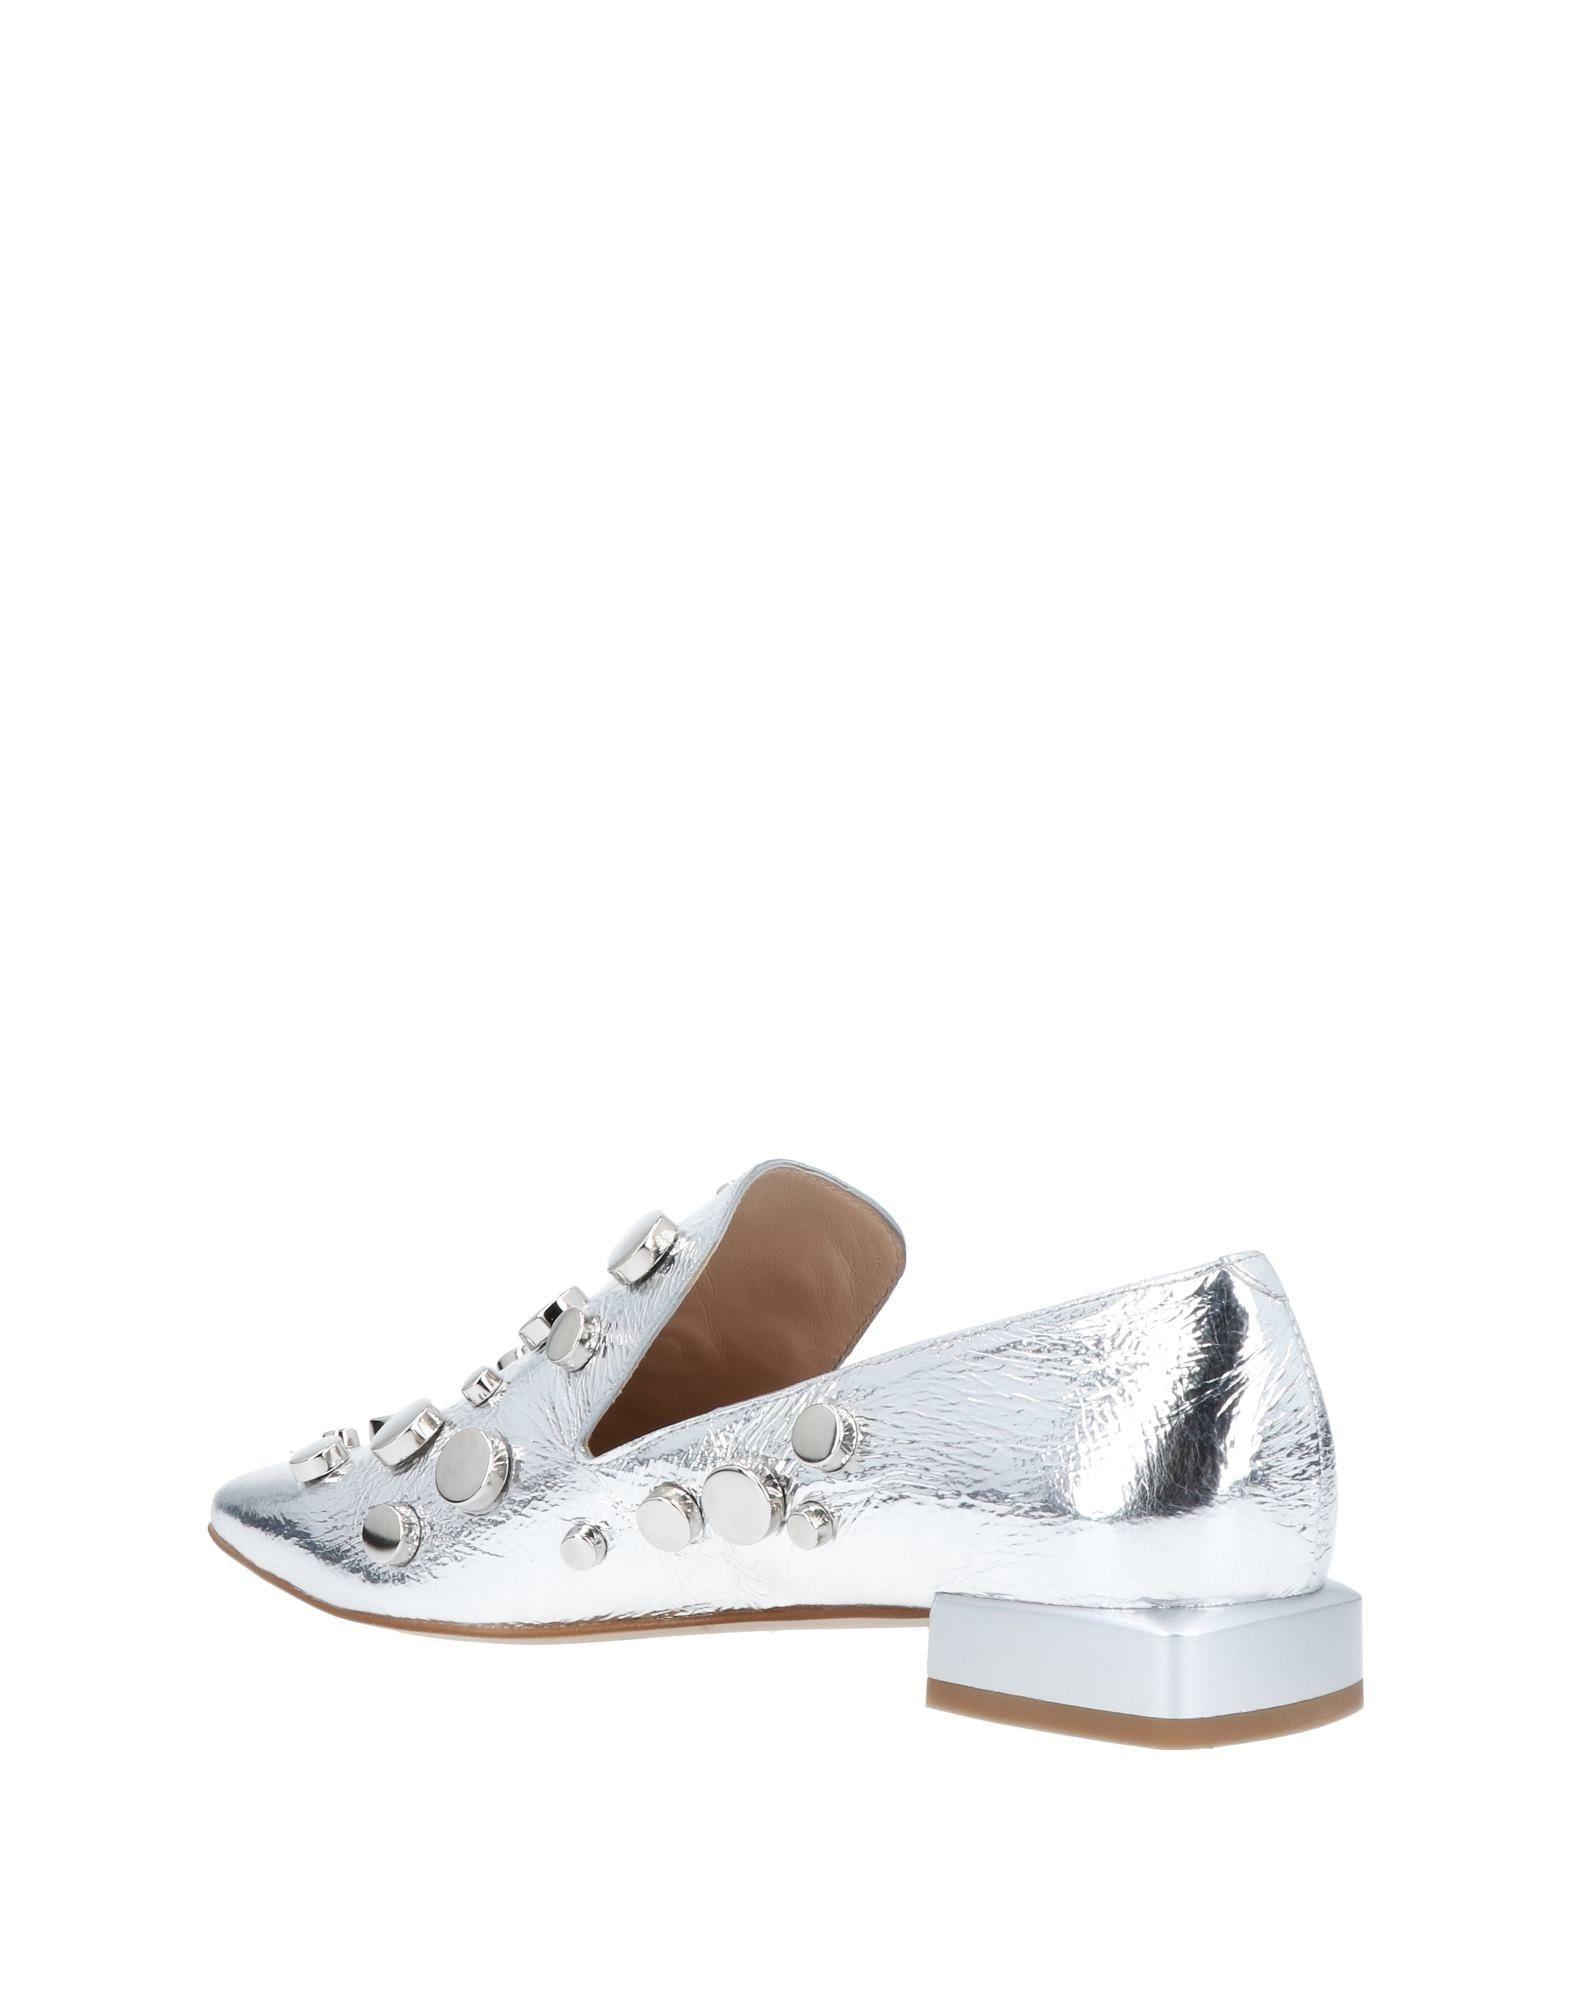 Stilvolle Zinda billige Schuhe Zinda Stilvolle Mokassins Damen  11448636FW 34d859